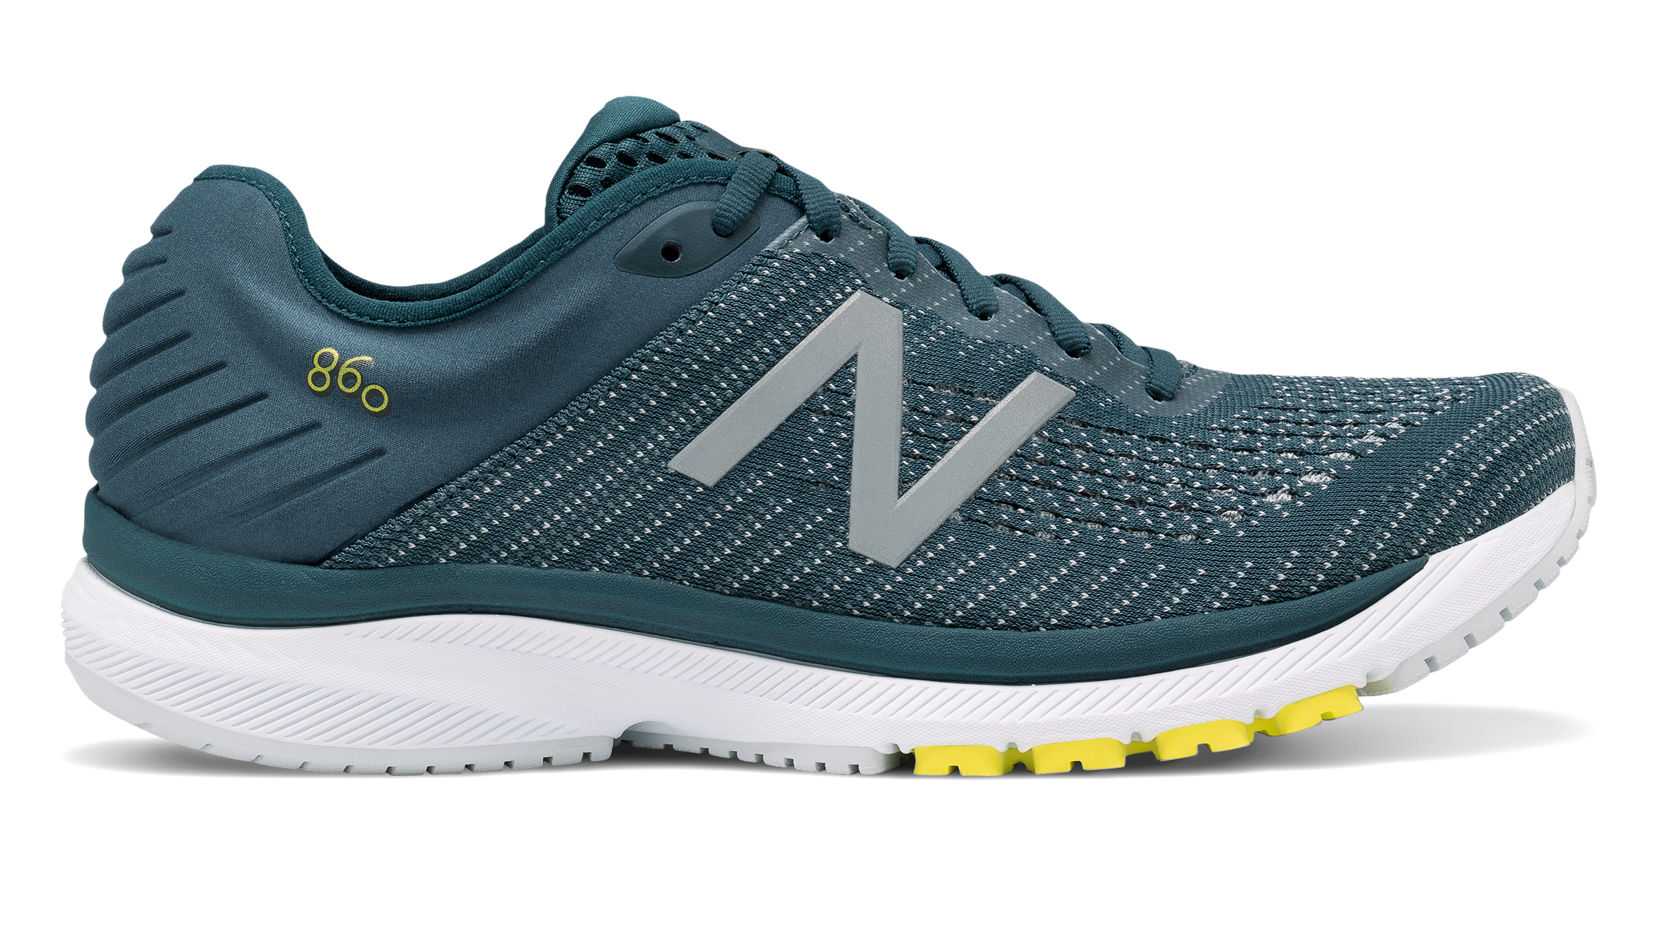 New Balance - New Balance Men's 860 V10 Running Shoe, Orion Blue/Yellow, 12.5 2E(W) US - Walmart.com